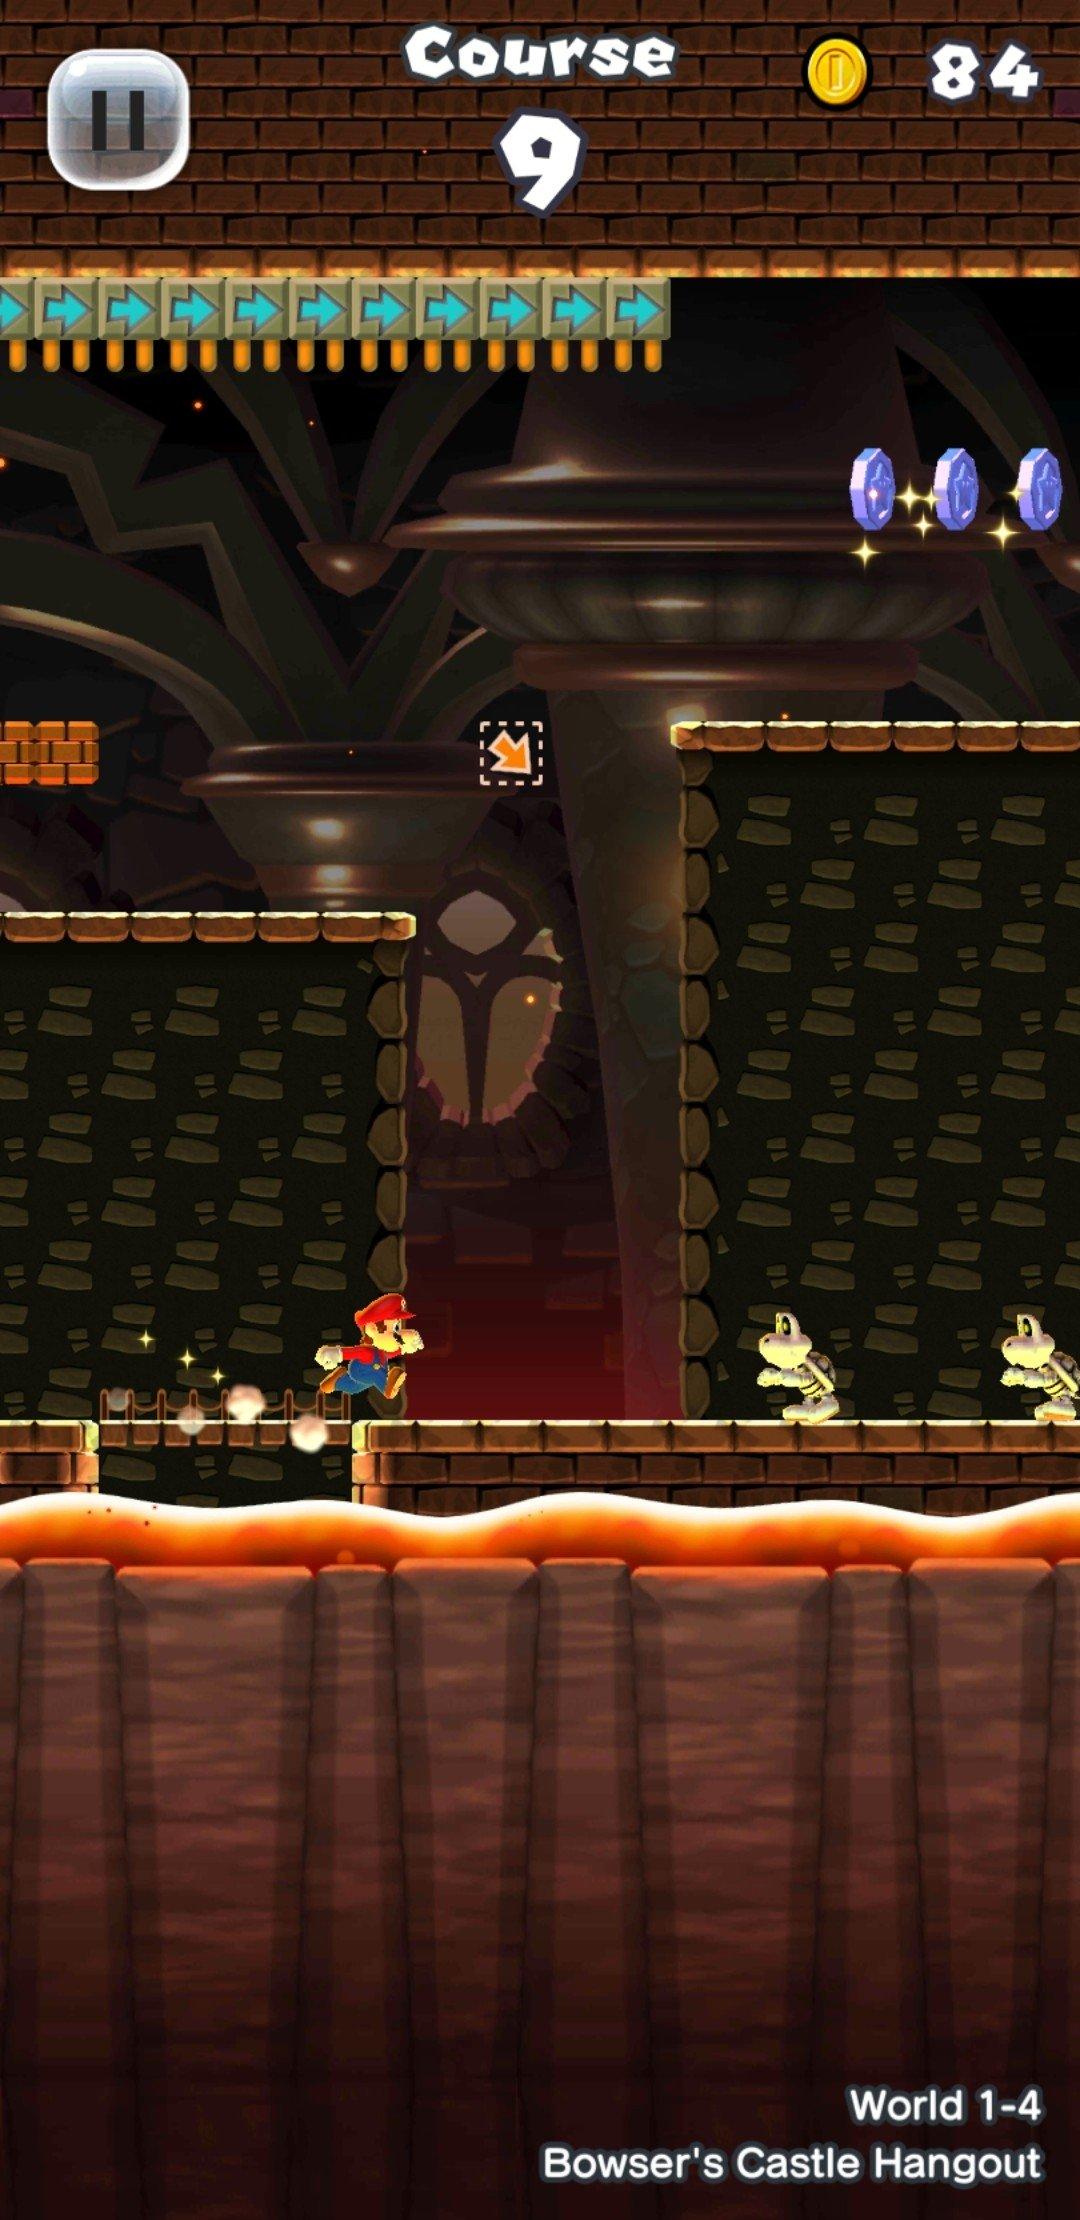 Super Mario Run Android image 8